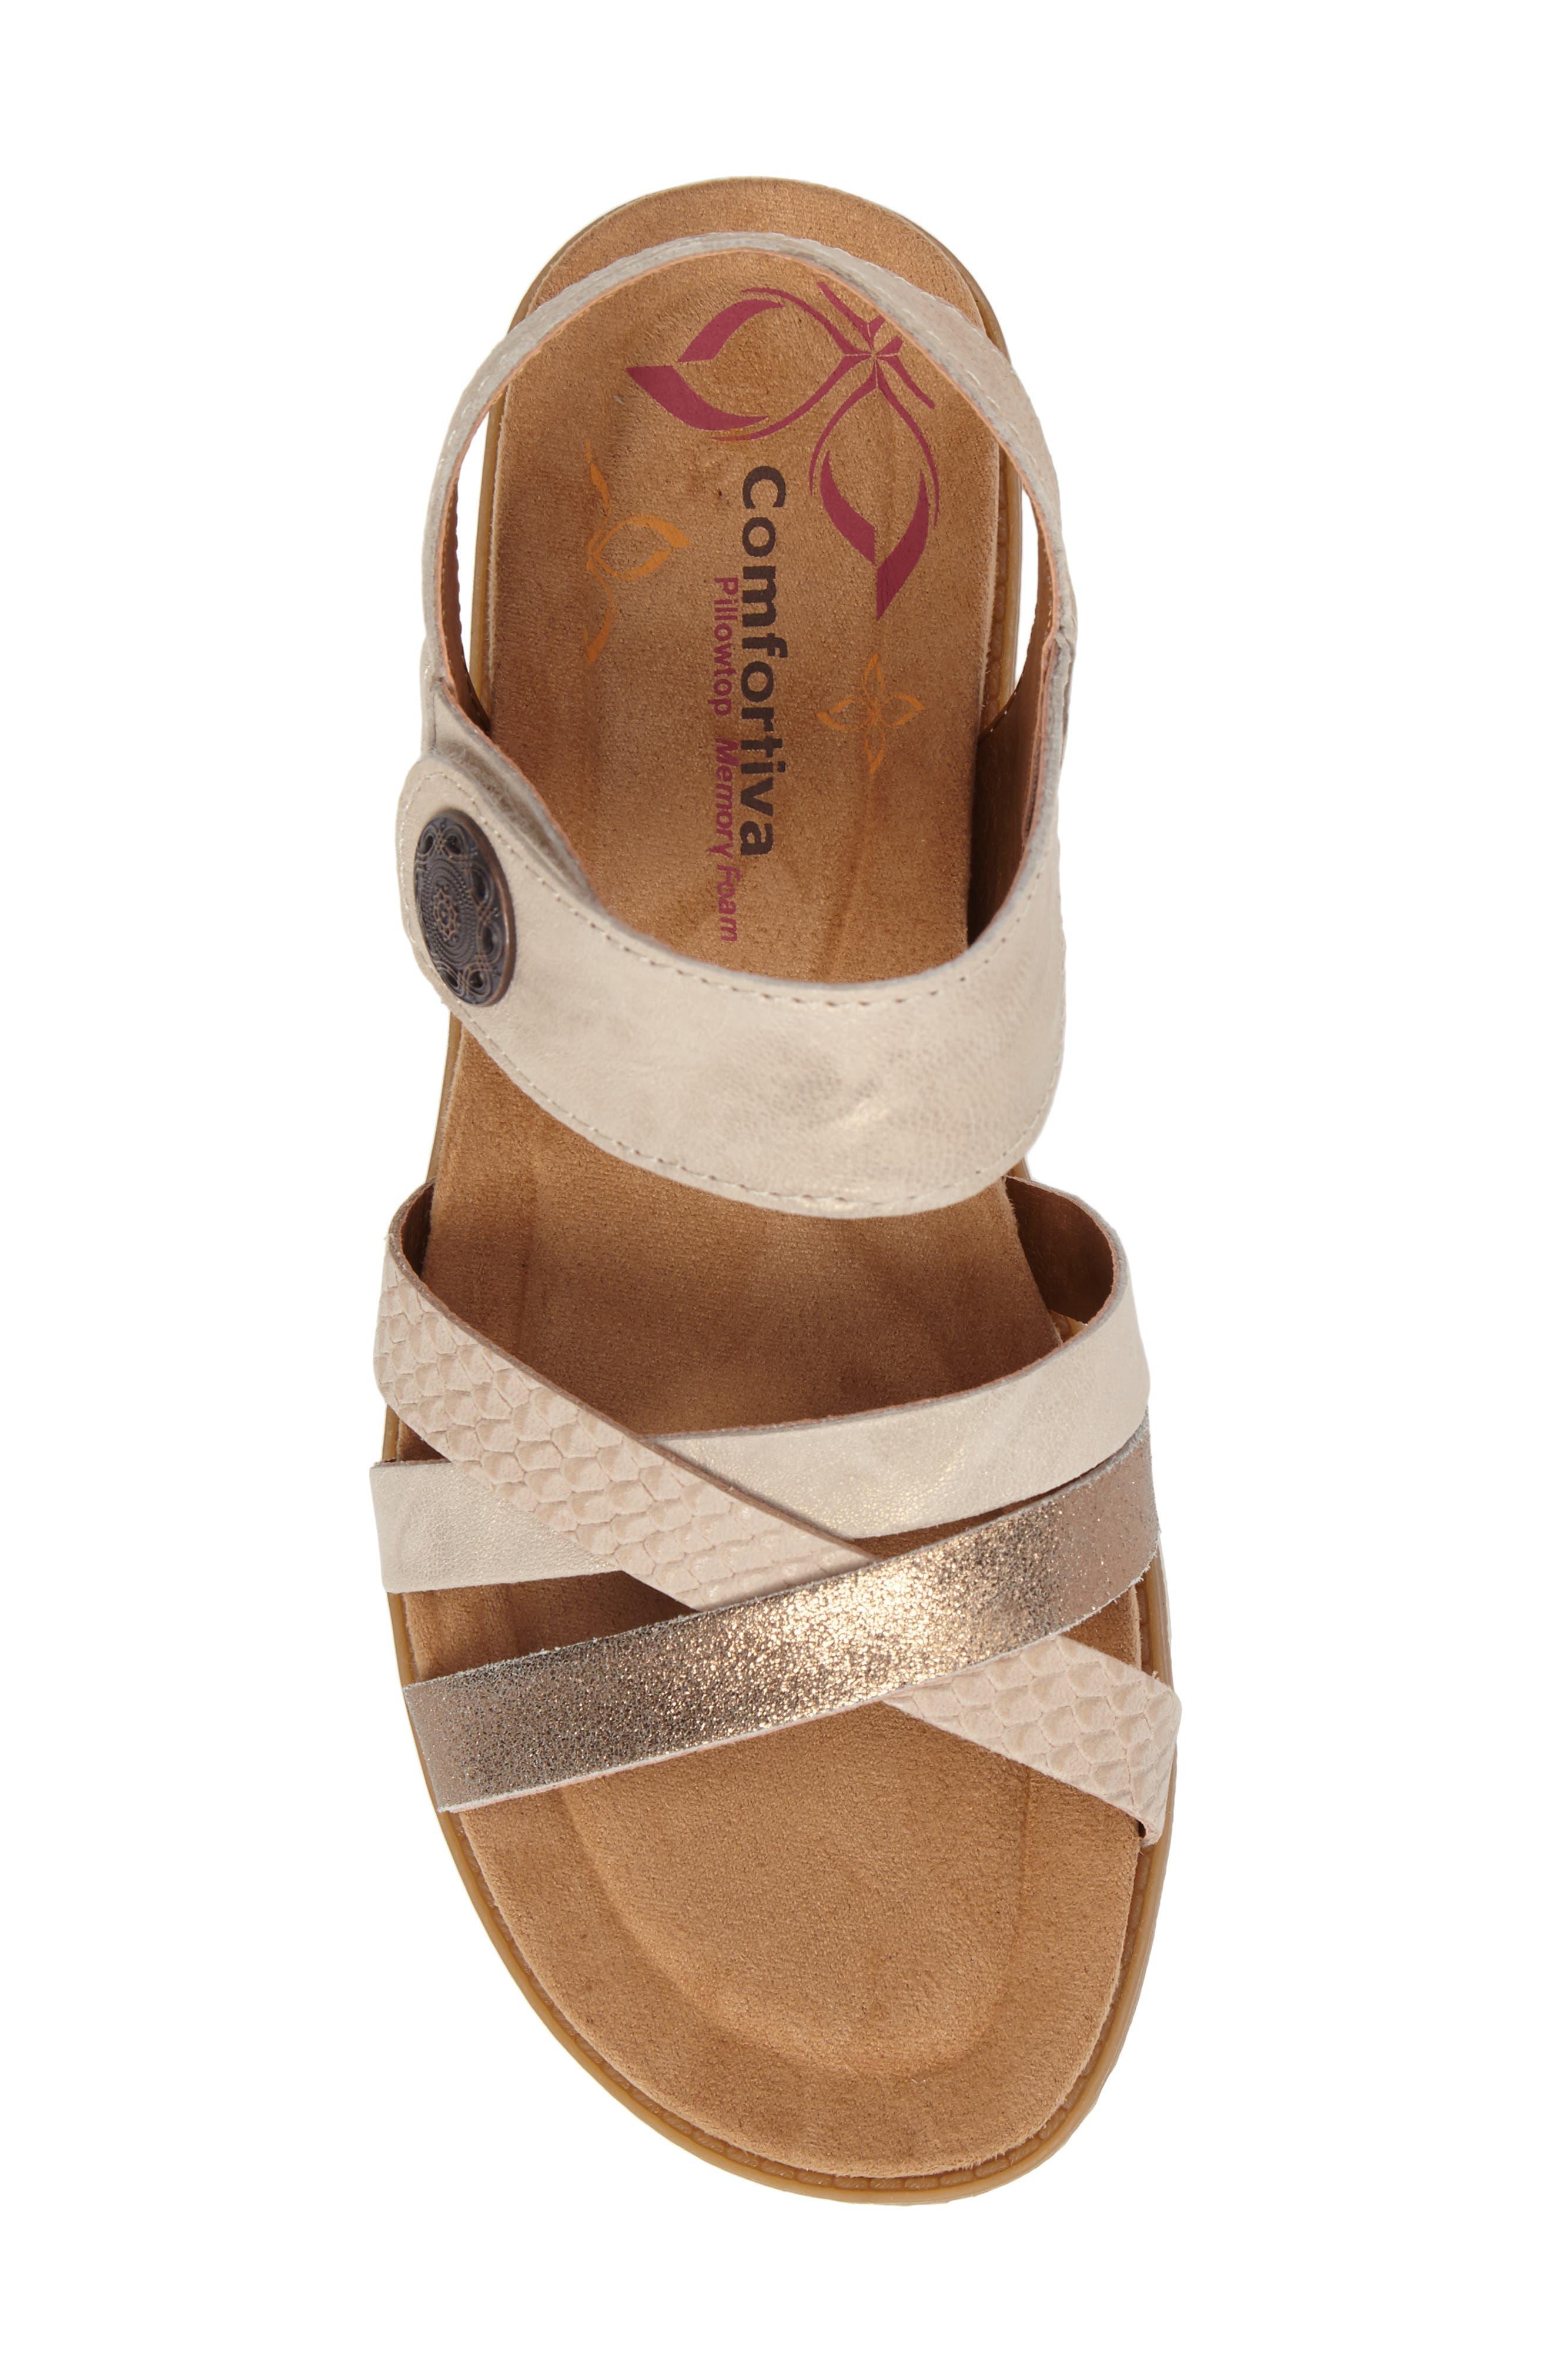 Alonsa Sandal,                             Alternate thumbnail 5, color,                             Light Grey/ Blush Leather